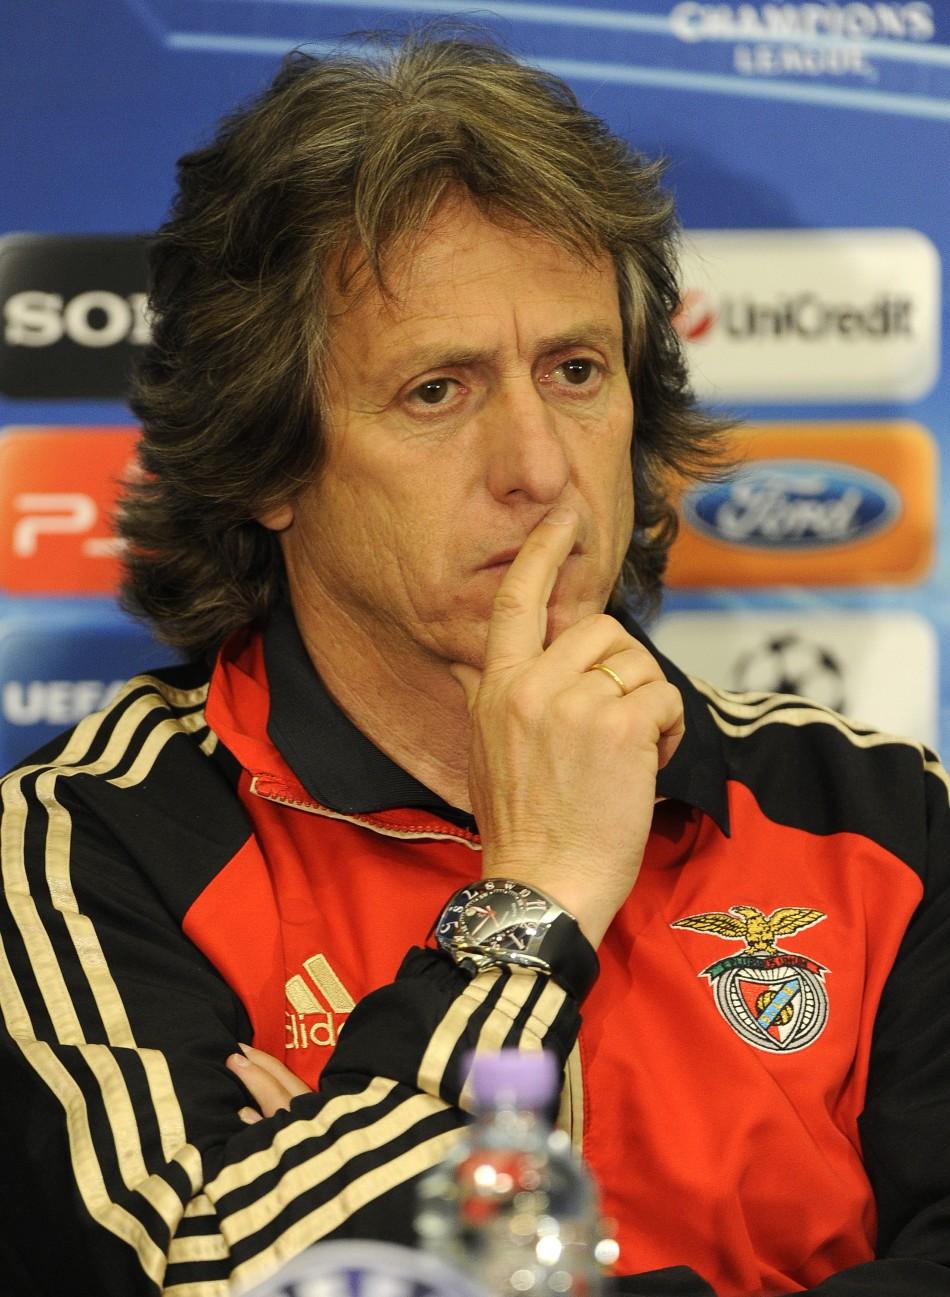 Benfica Manager Jorge Jesus